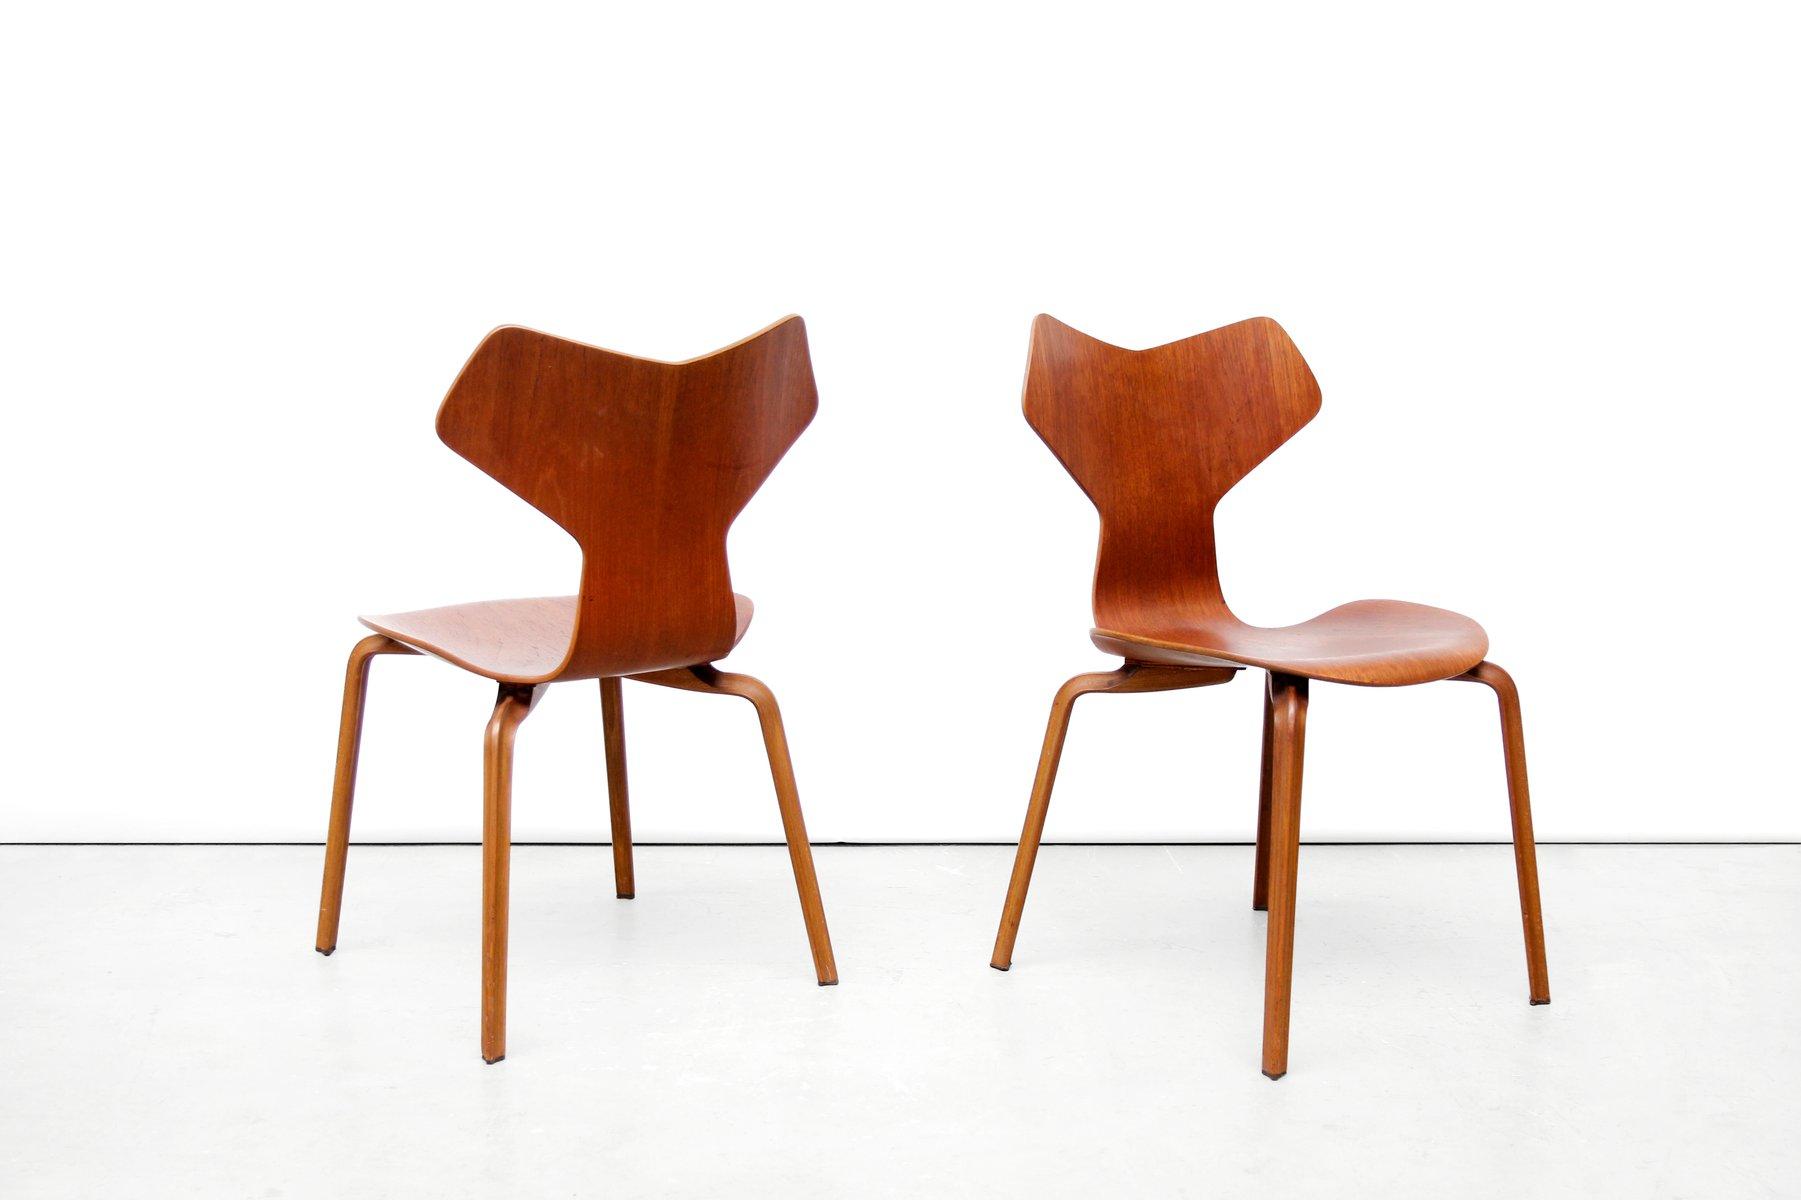 teak grand prix st hle von arne jacobsen f r fritz hansen. Black Bedroom Furniture Sets. Home Design Ideas